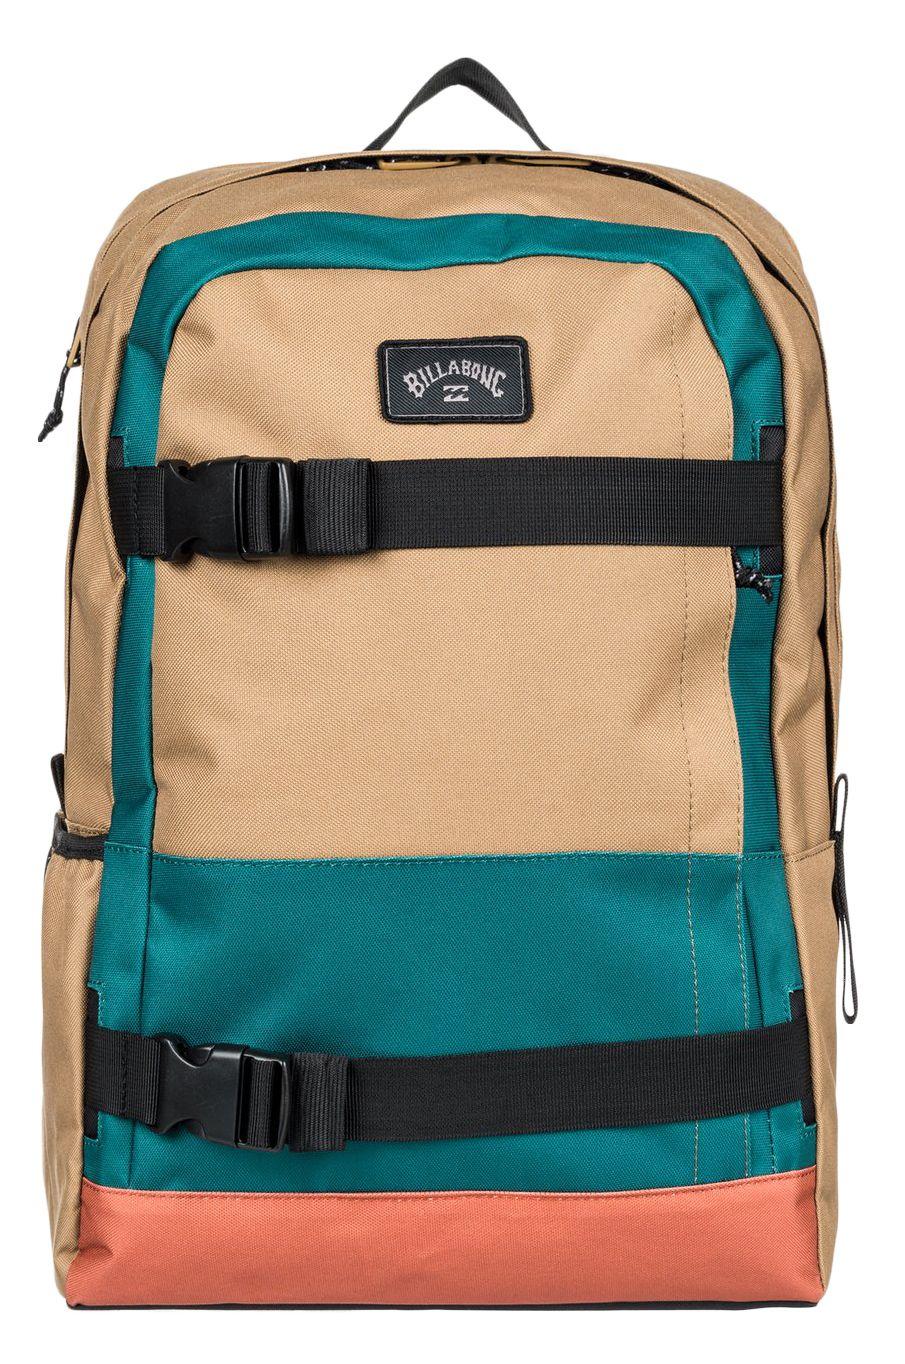 Billabong Backpack COMMAND SKATE Deep Red